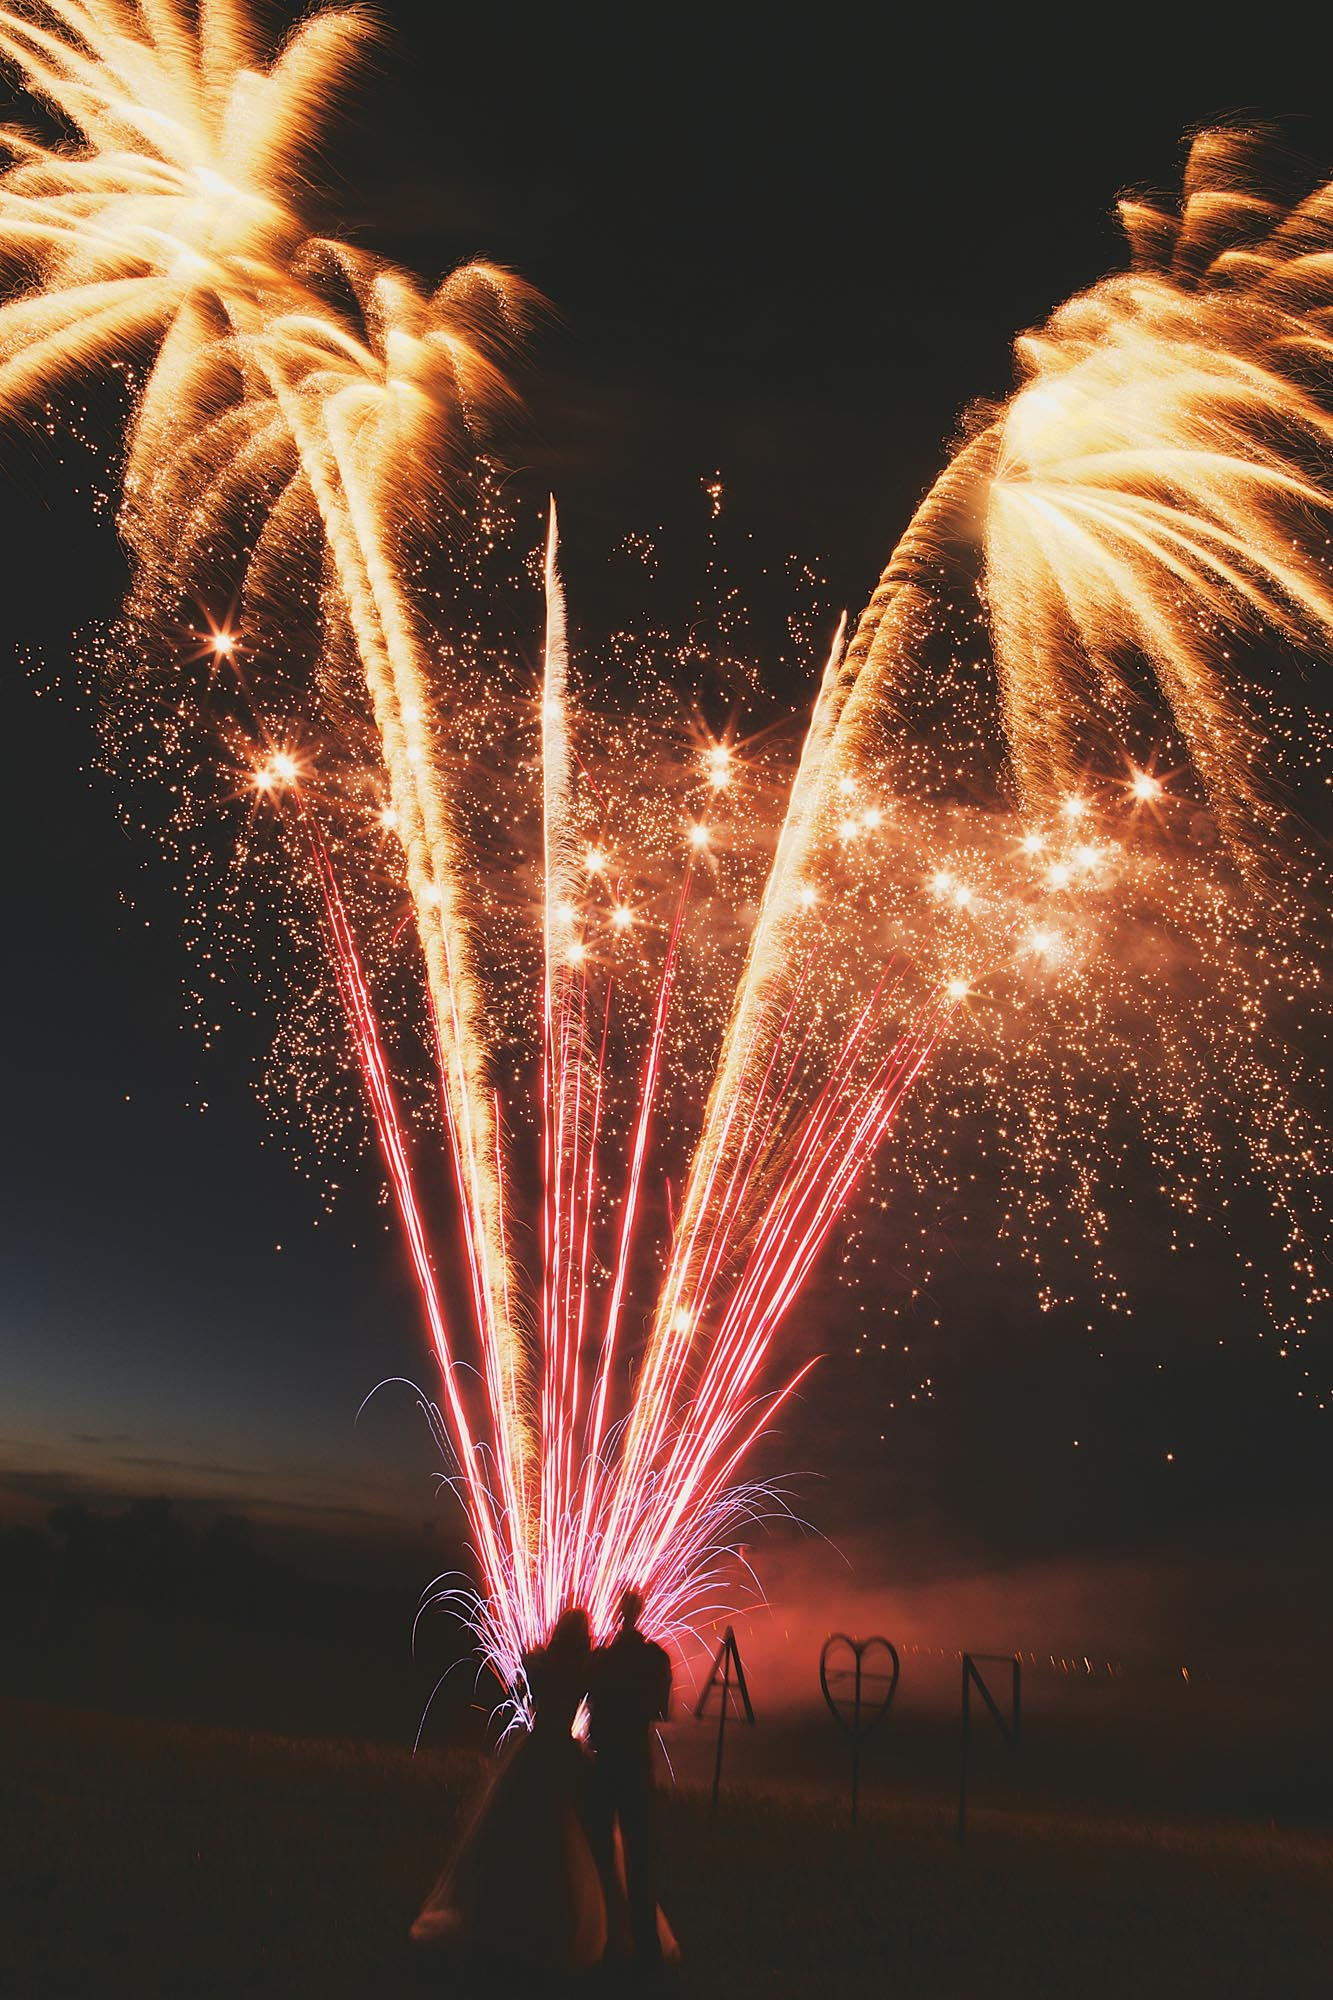 Fireworks Display at Huntstile Farm